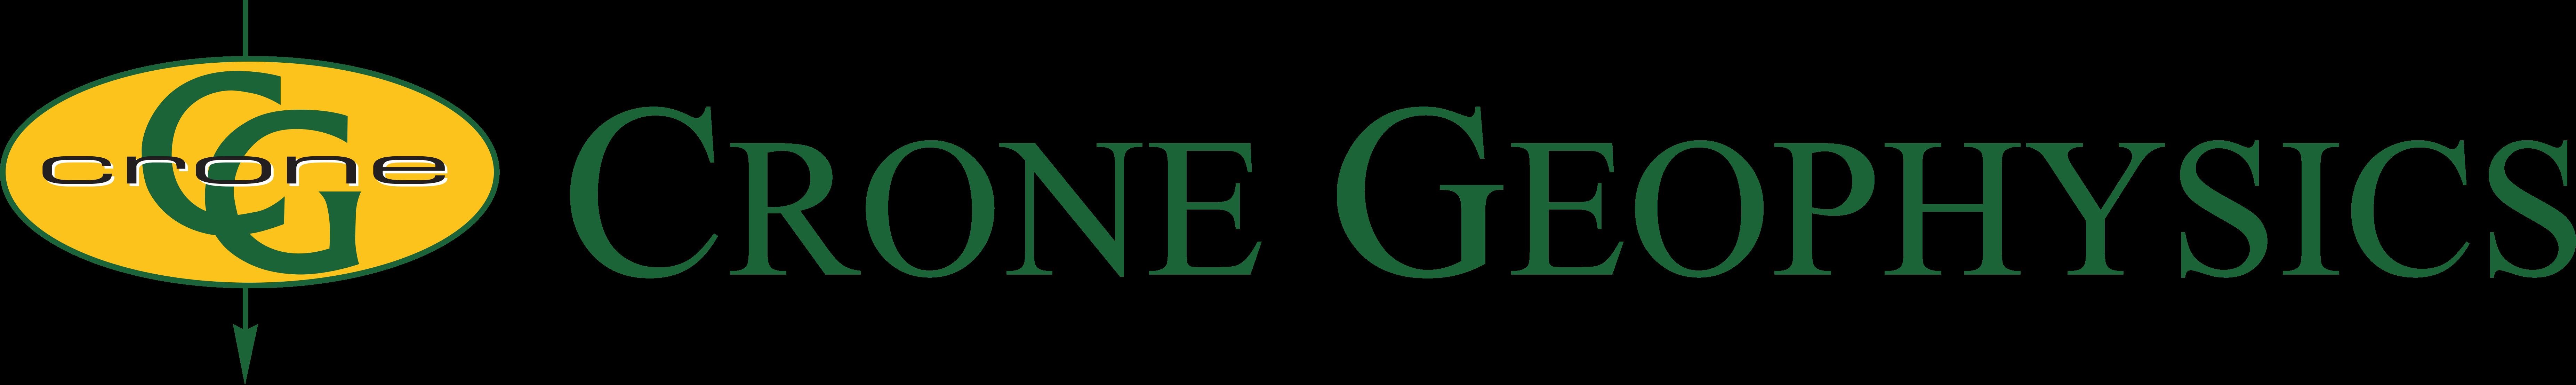 Crone Geophysics